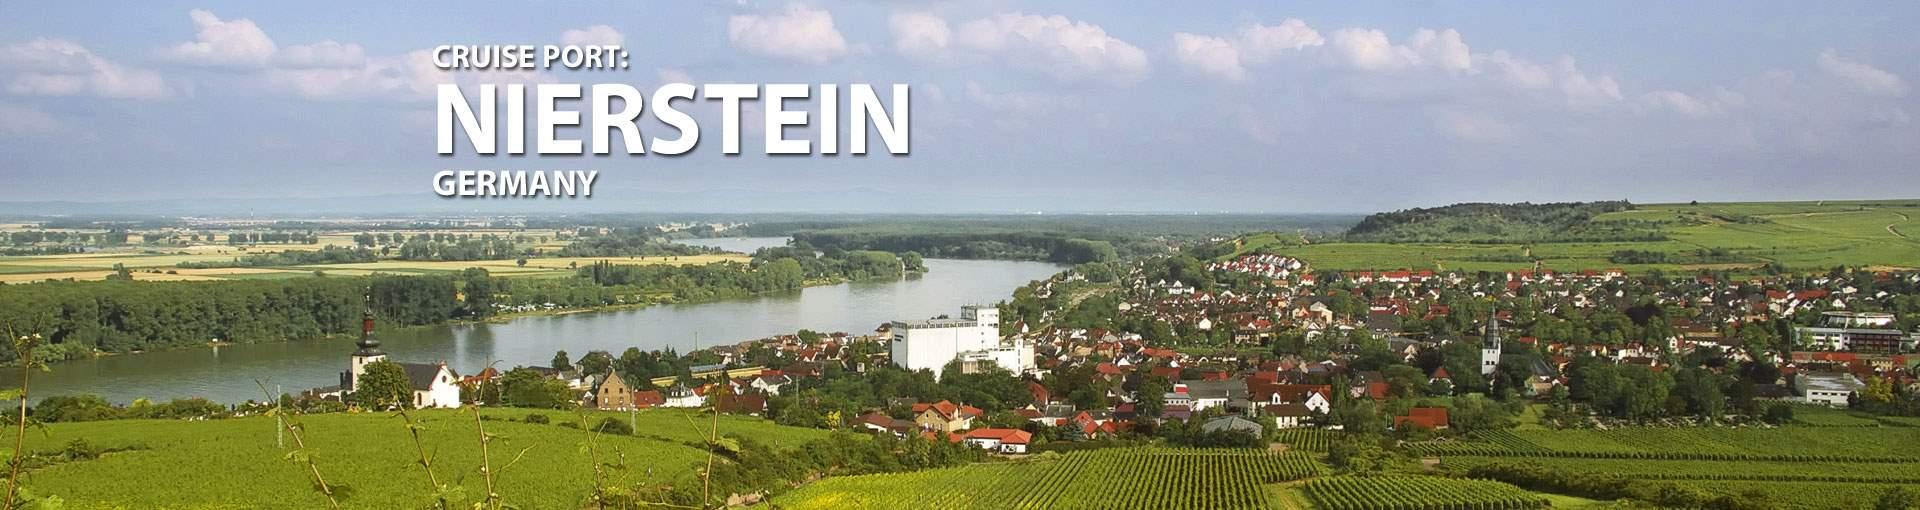 Cruises to Nierstein, Germany